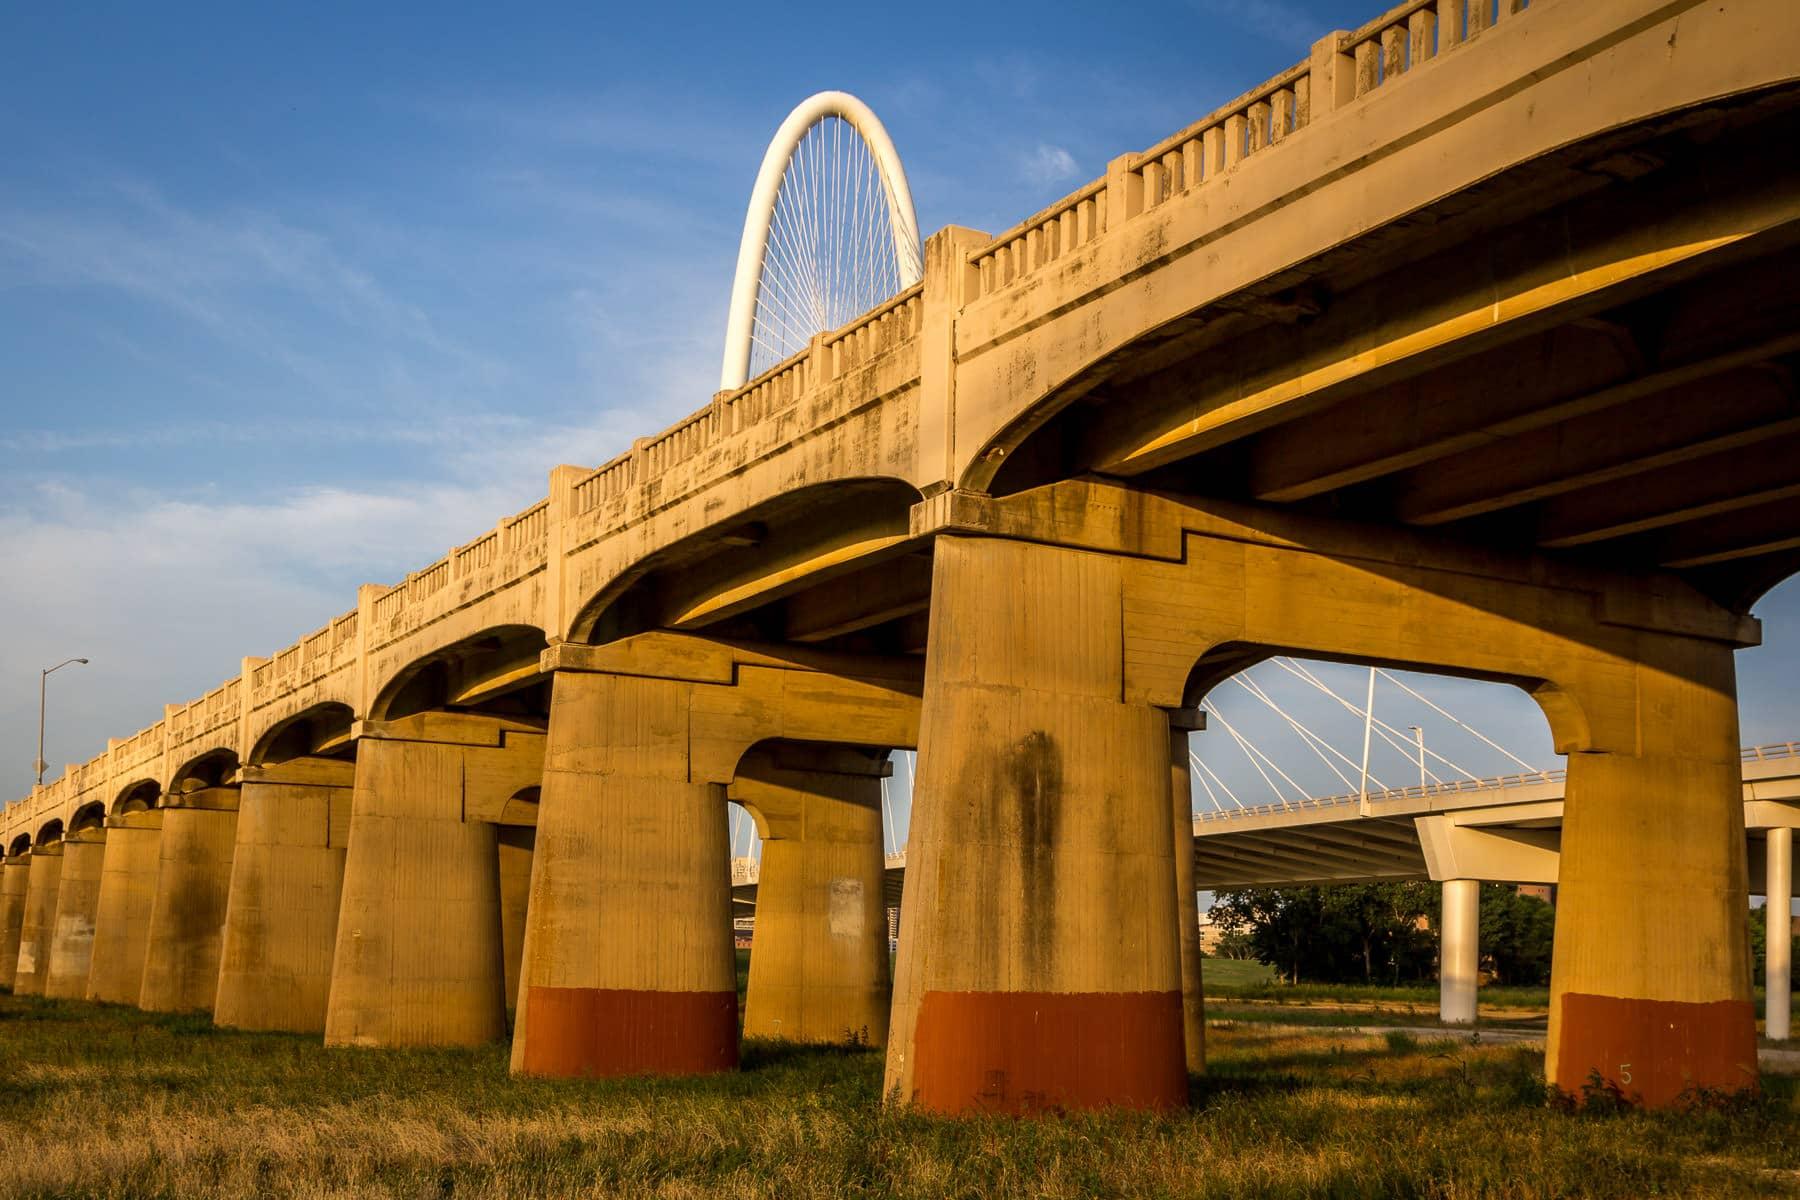 Dallas' Continental Avenue Bridge spans the Trinity River as the Santiago Calatrava-designed Margaret Hunt Hill Bridge looms in the background.